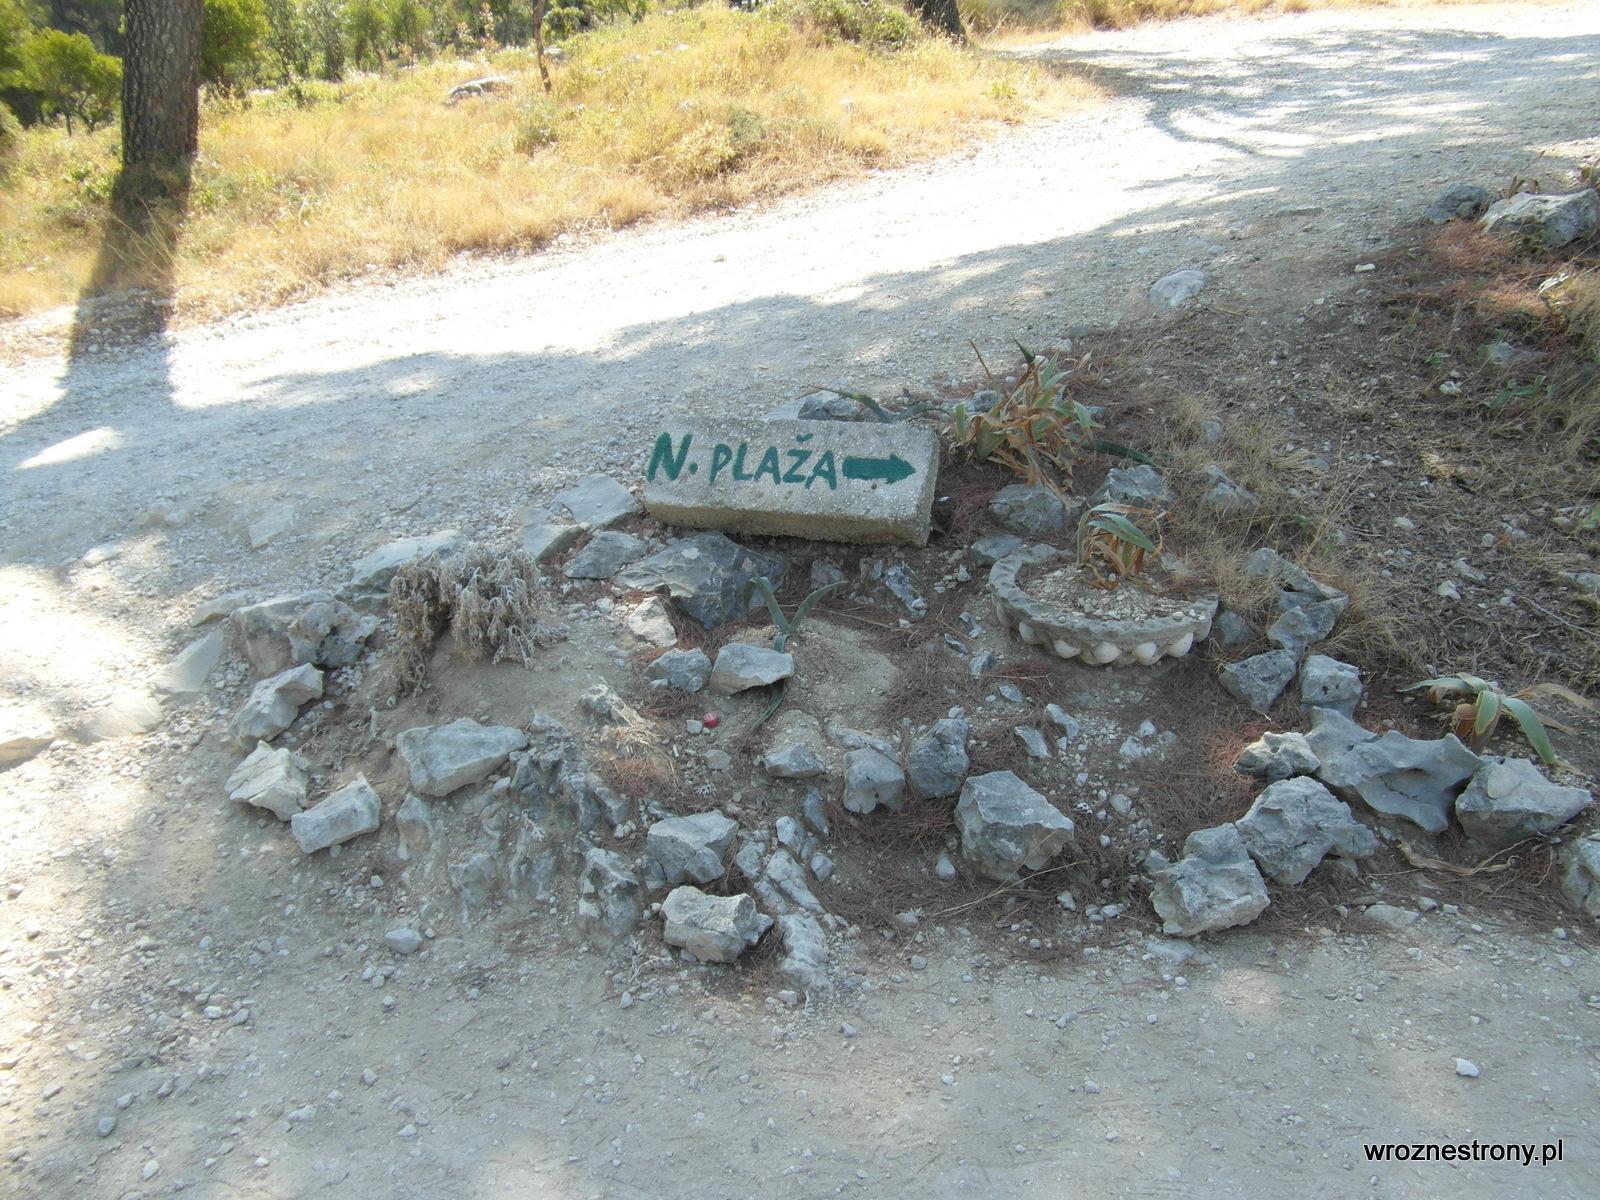 Drogowskaz do plaży Nugal